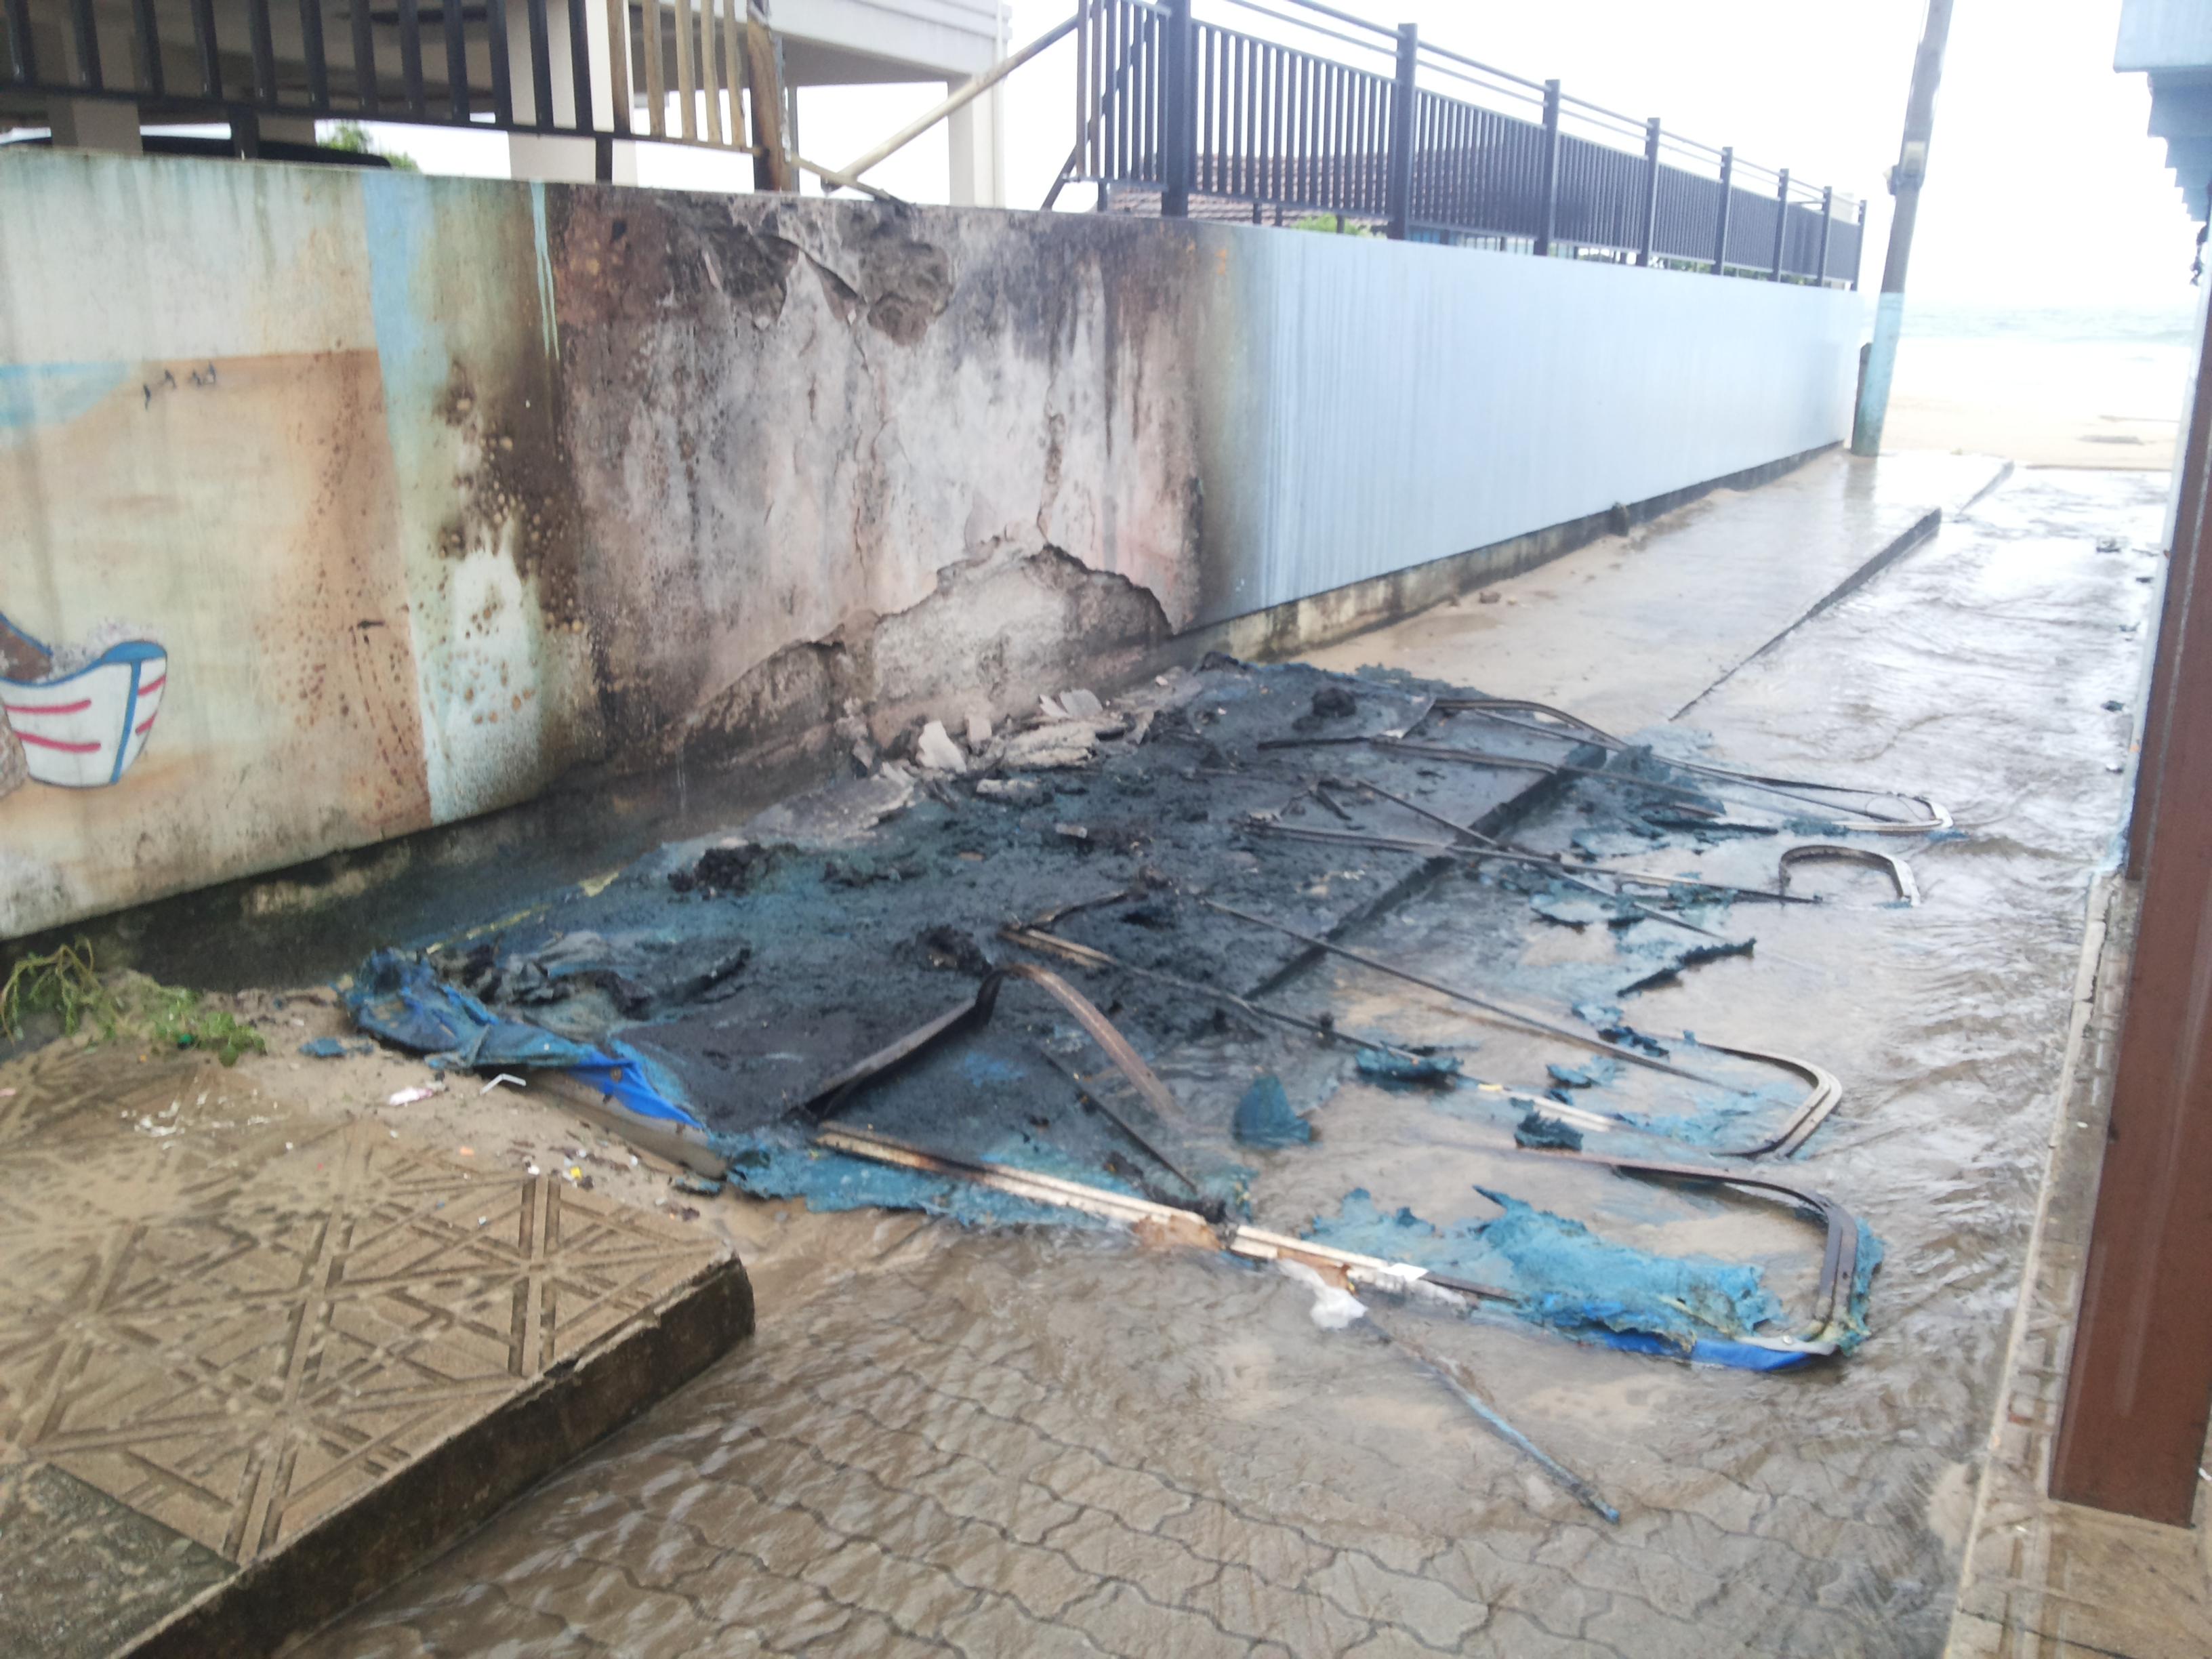 banheiros-fogo-ingleses-vandalismo